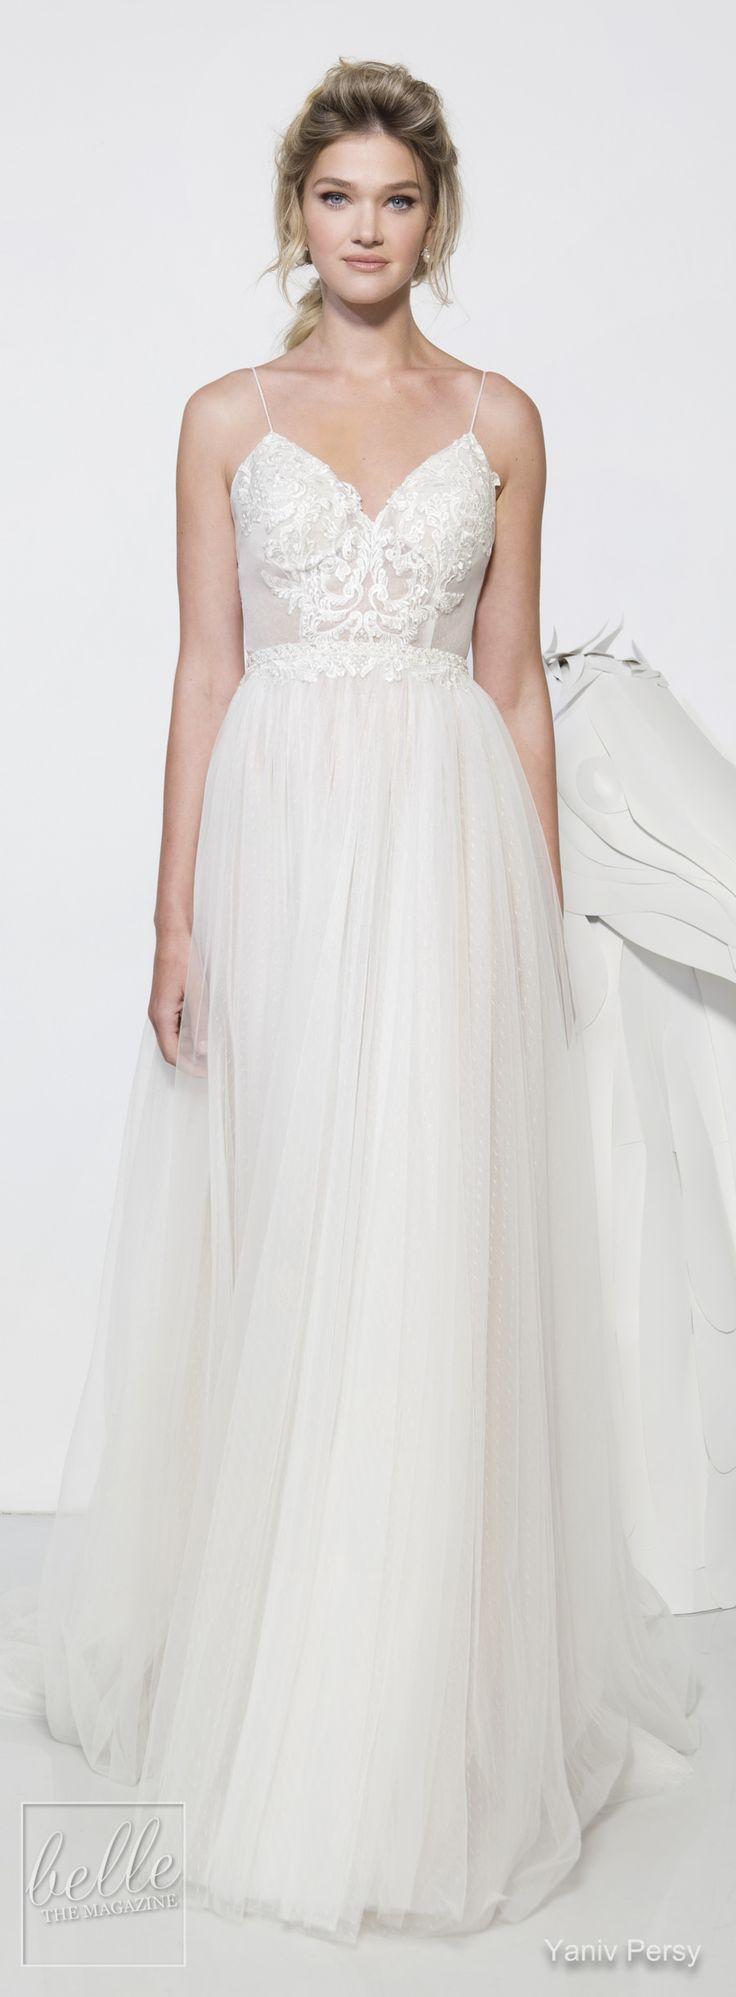 Anne of green gables wedding dress   best Wedding dress love images on Pinterest  Homecoming